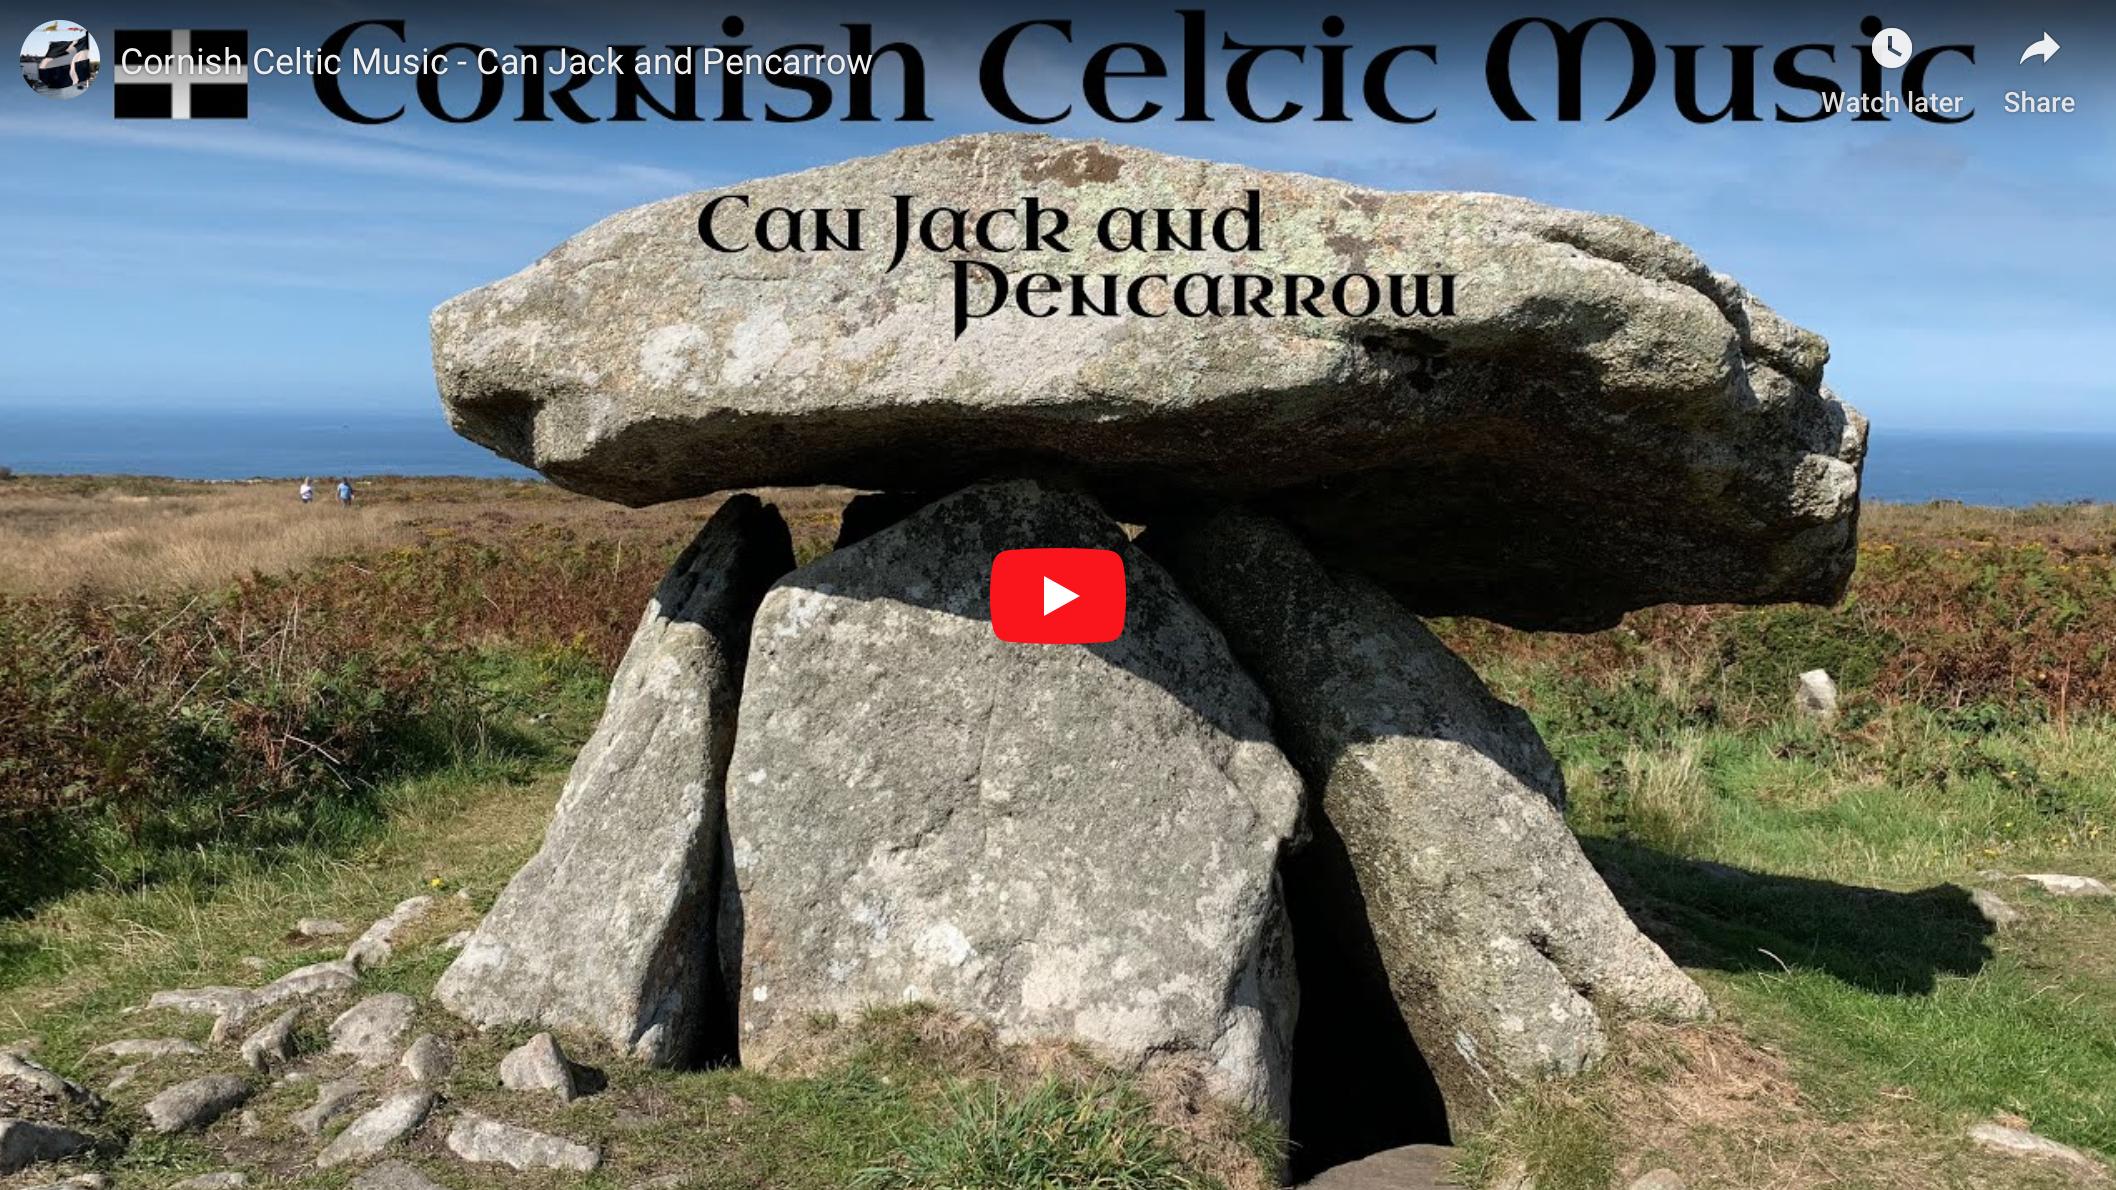 Thumbnail of a YouTube video showing Chûn Quoit